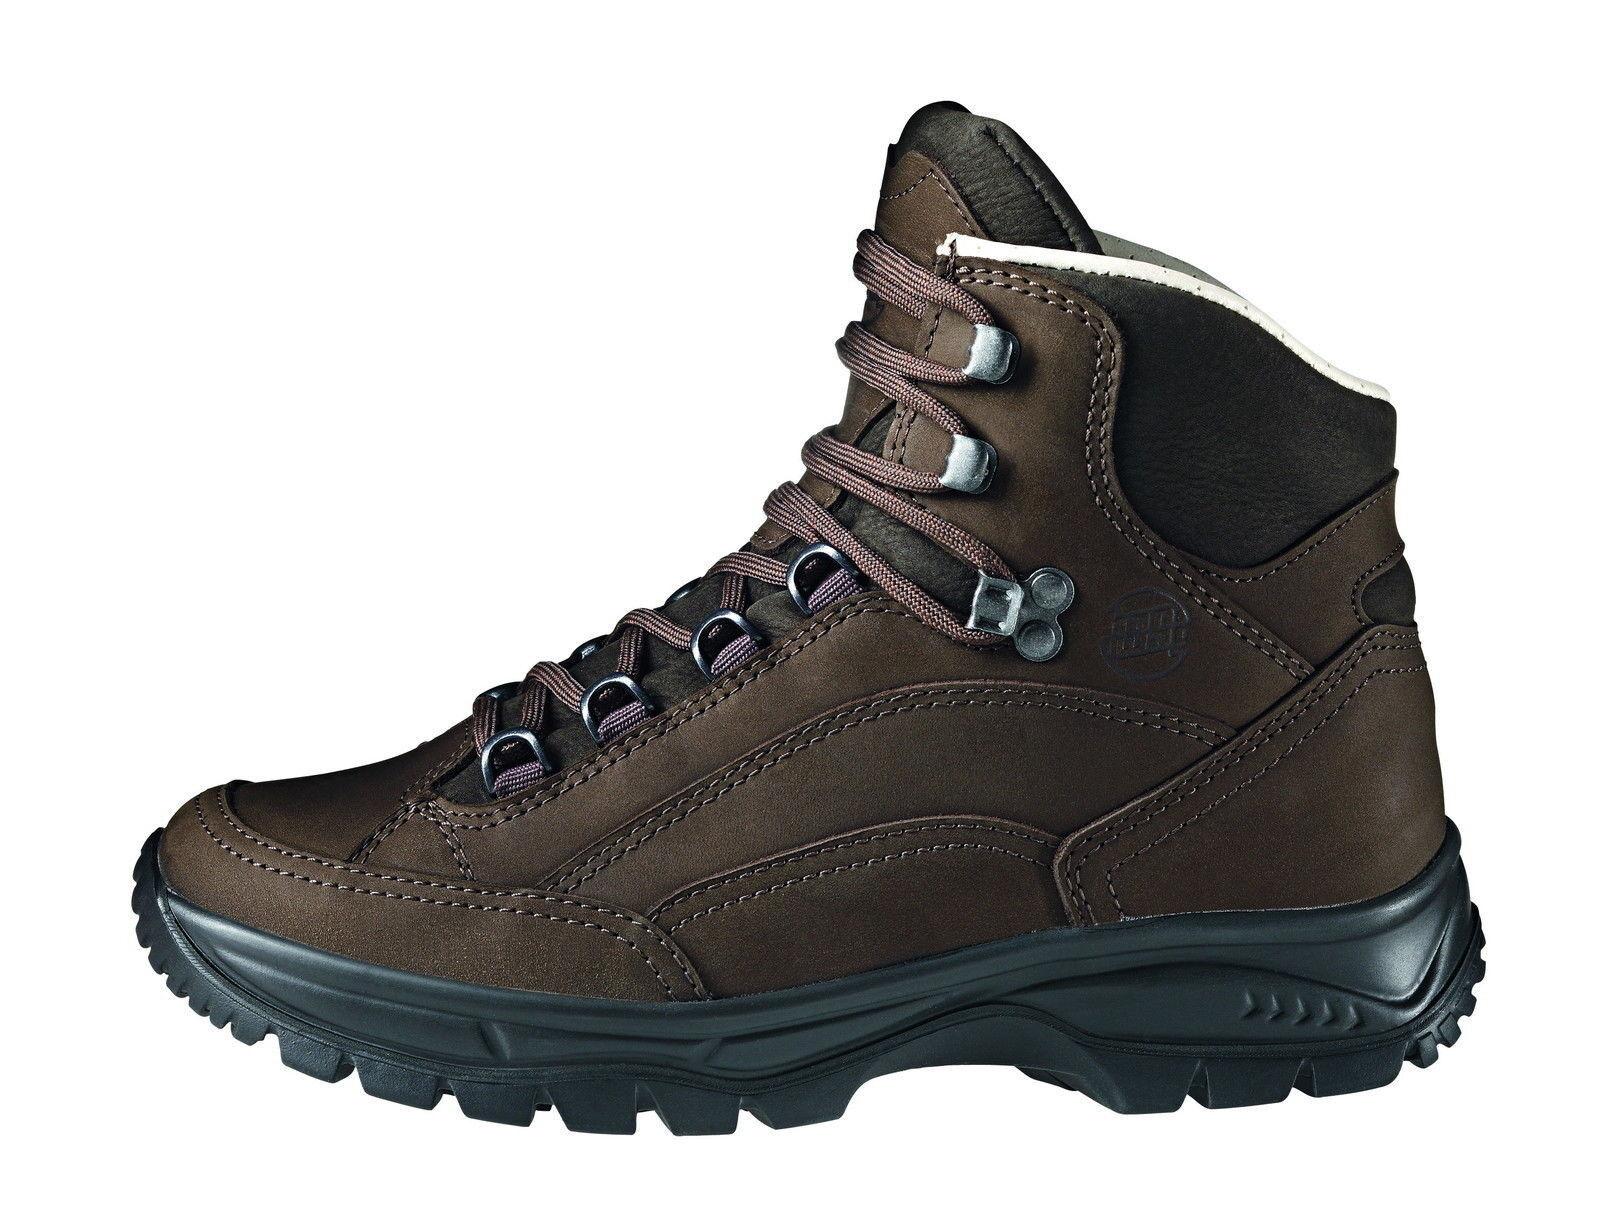 Hanwag Mountain shoes Alta Bunion Size 11,5 -